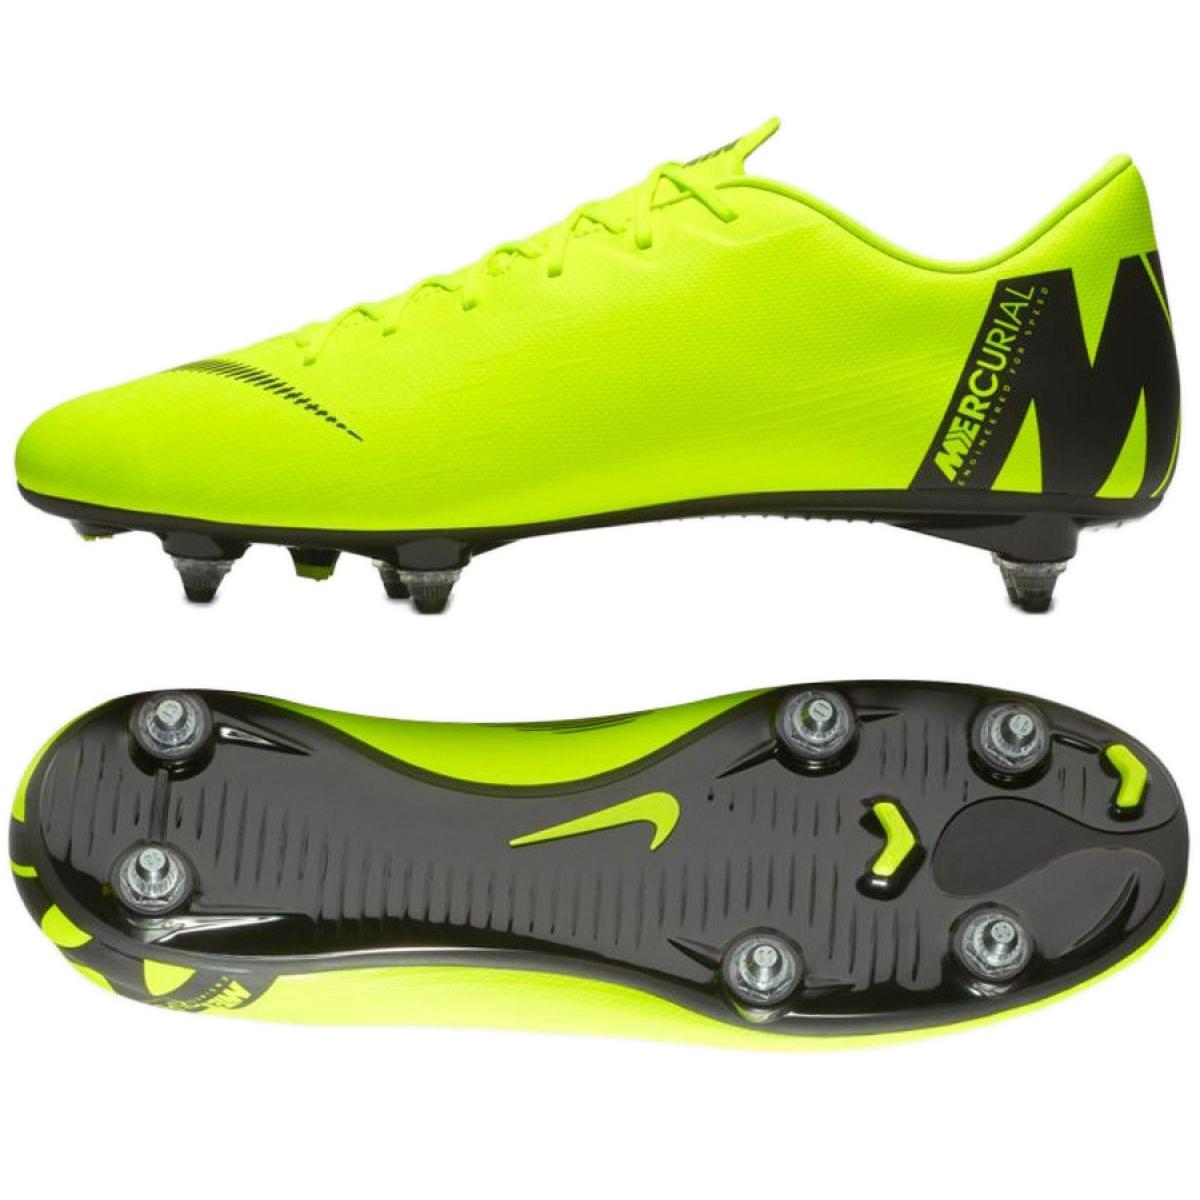 Chuteira Futebol Nike Vapor 12 Academy FG AH7375 701